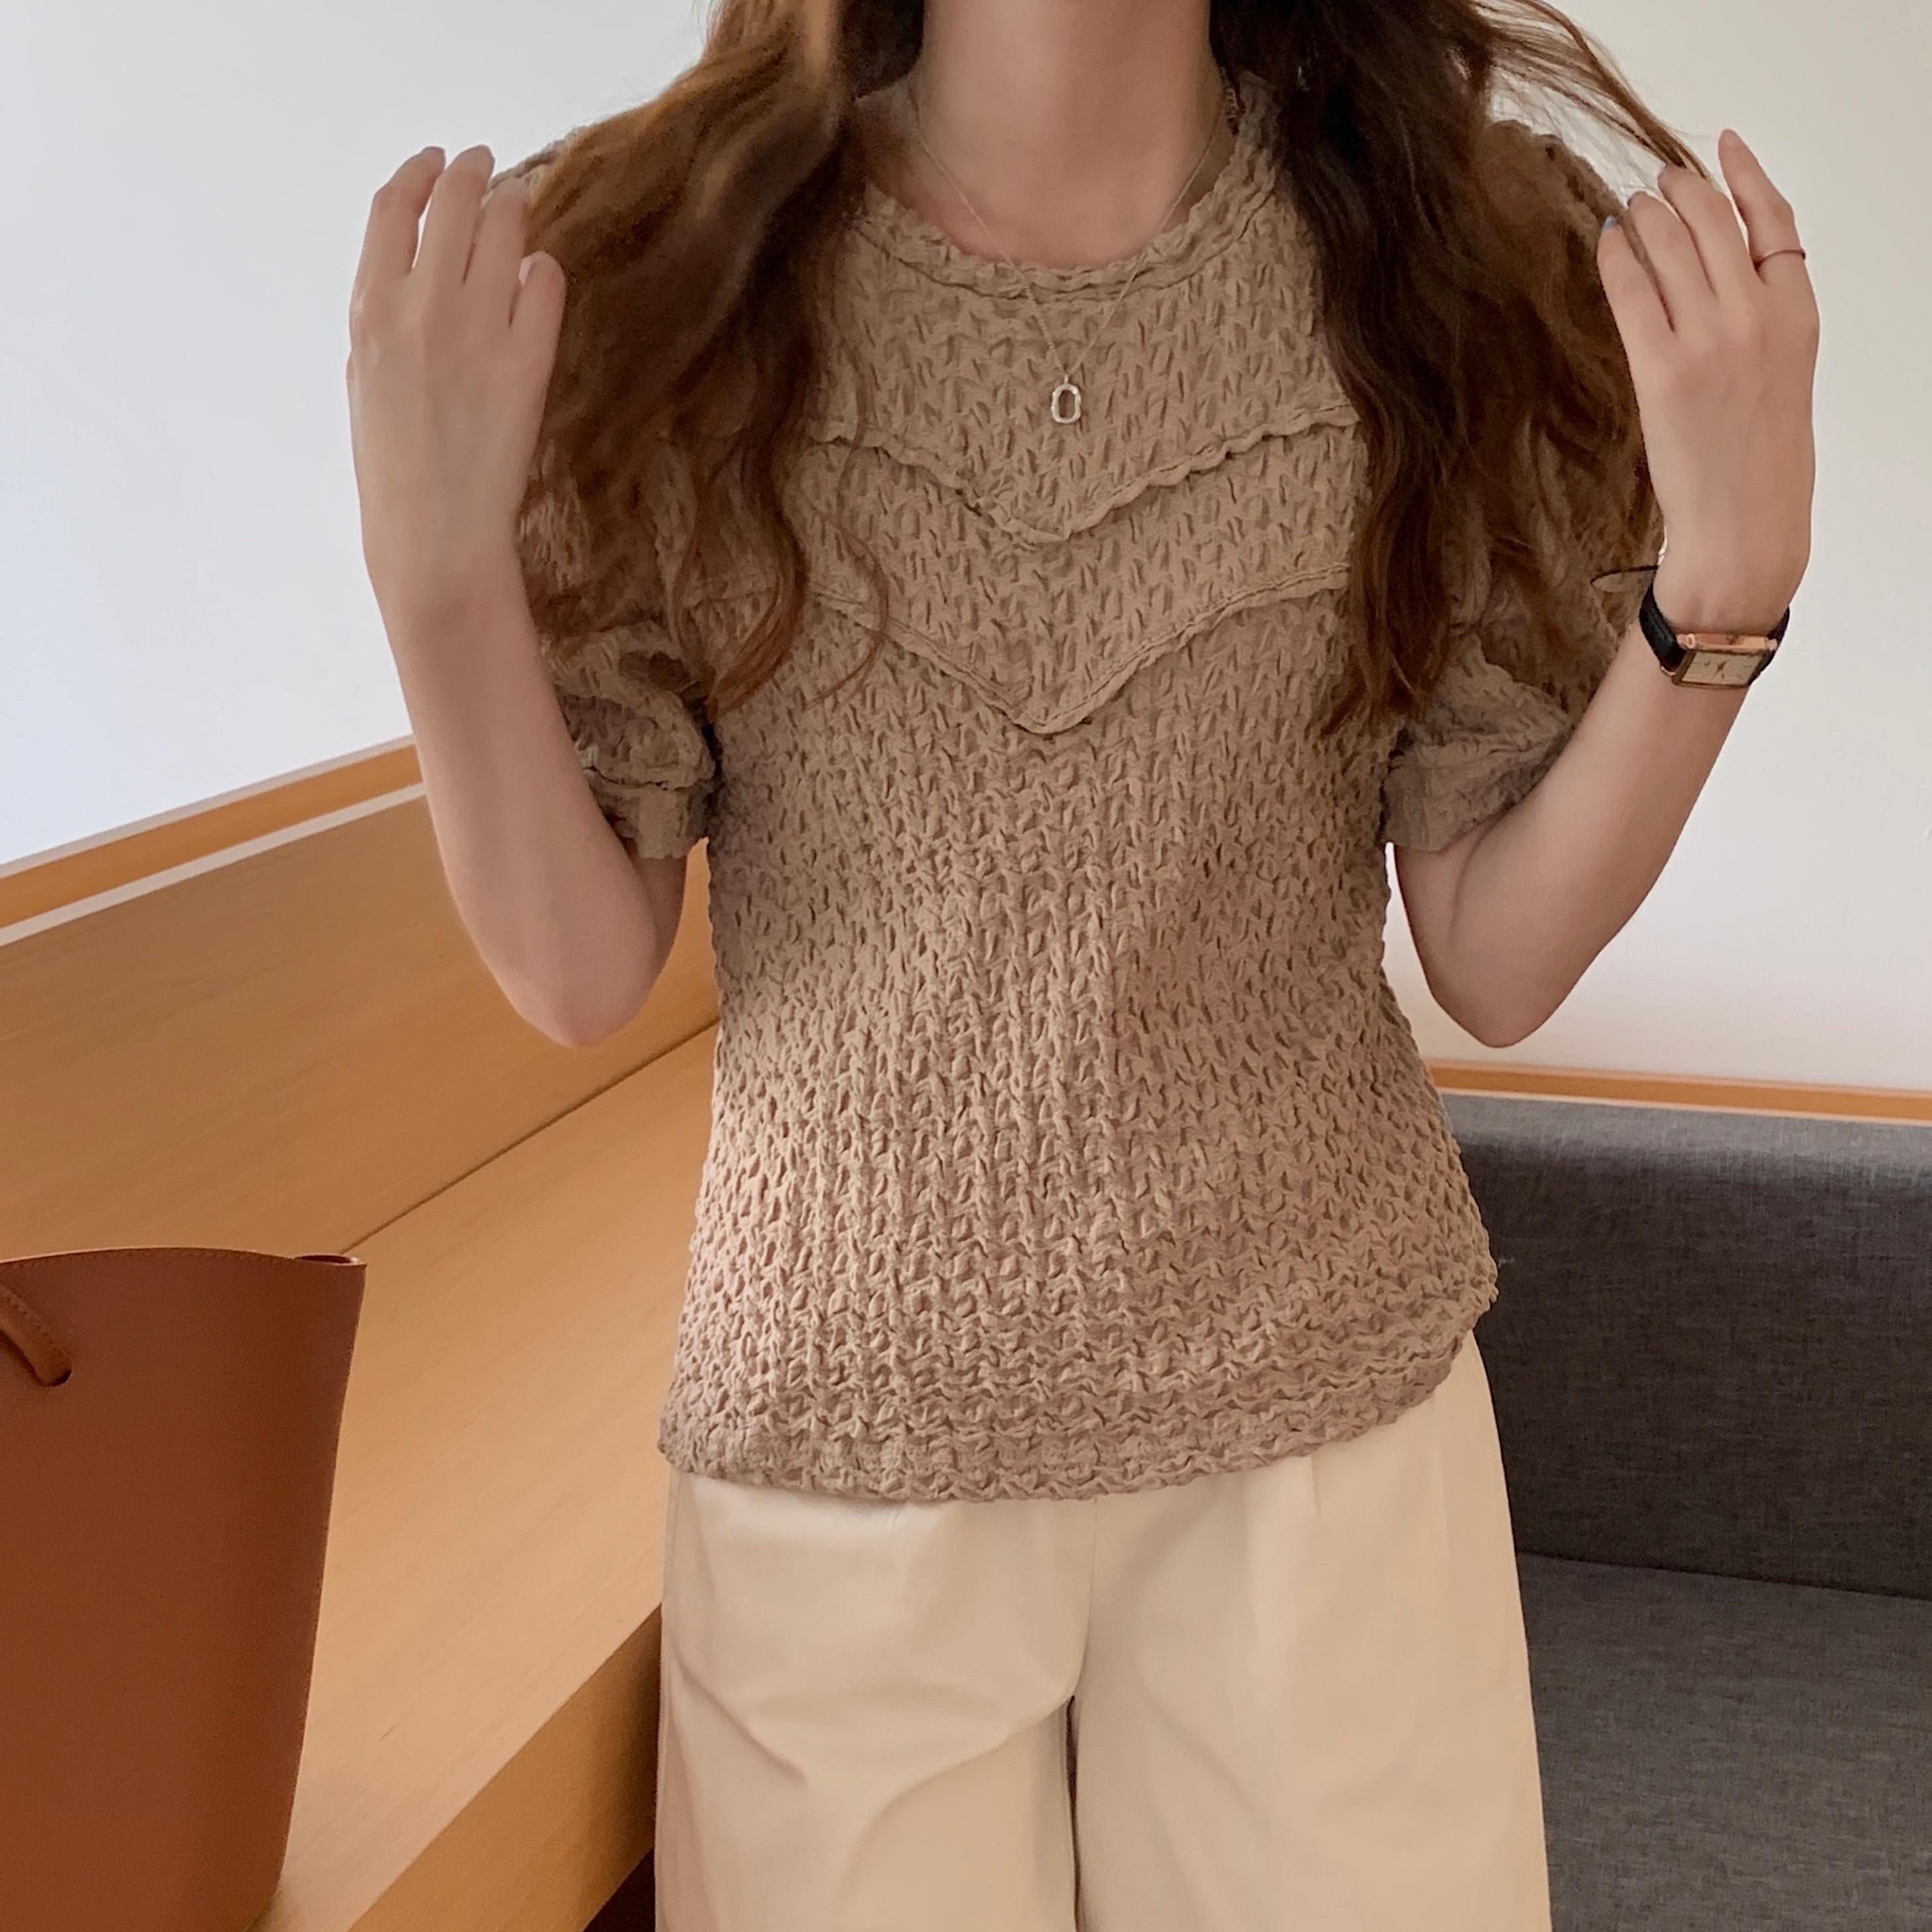 H4a449874f81848c9adb8d779985ae3cf5 - Summer O-Neck Short Sleeves Pleated Blouse